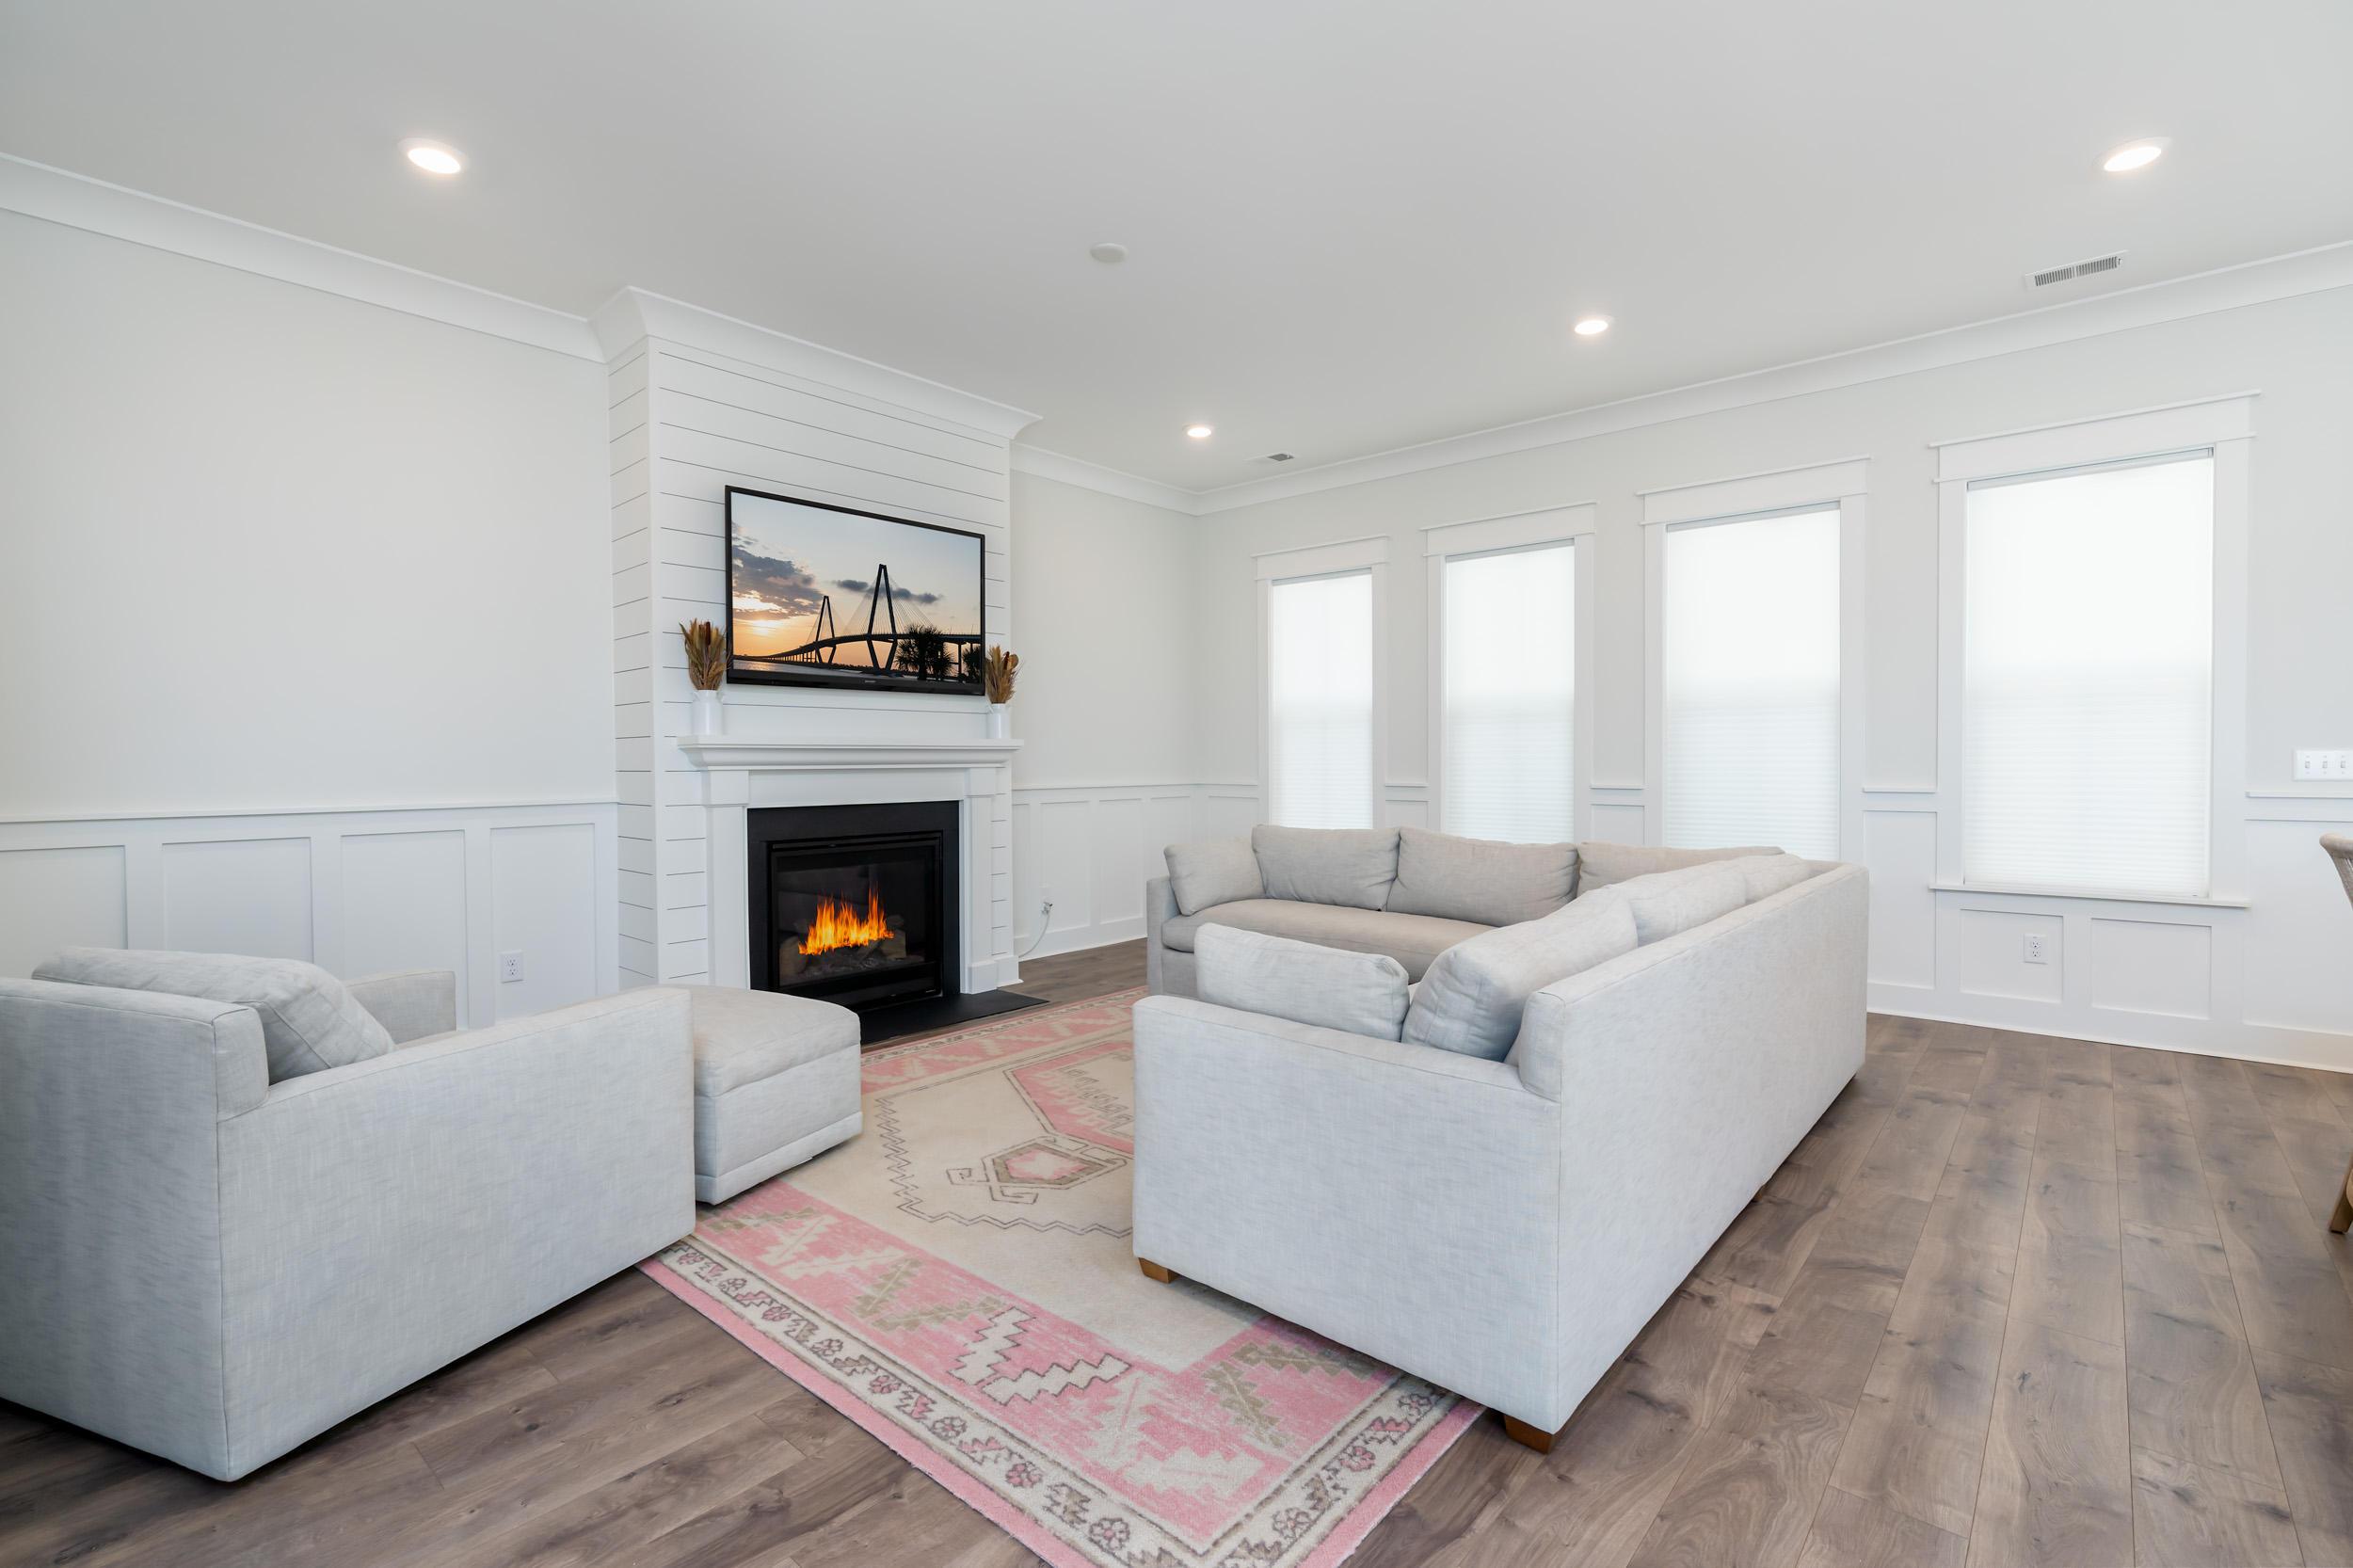 Hamlin Oaks Homes For Sale - 2921 Tranquility, Mount Pleasant, SC - 14